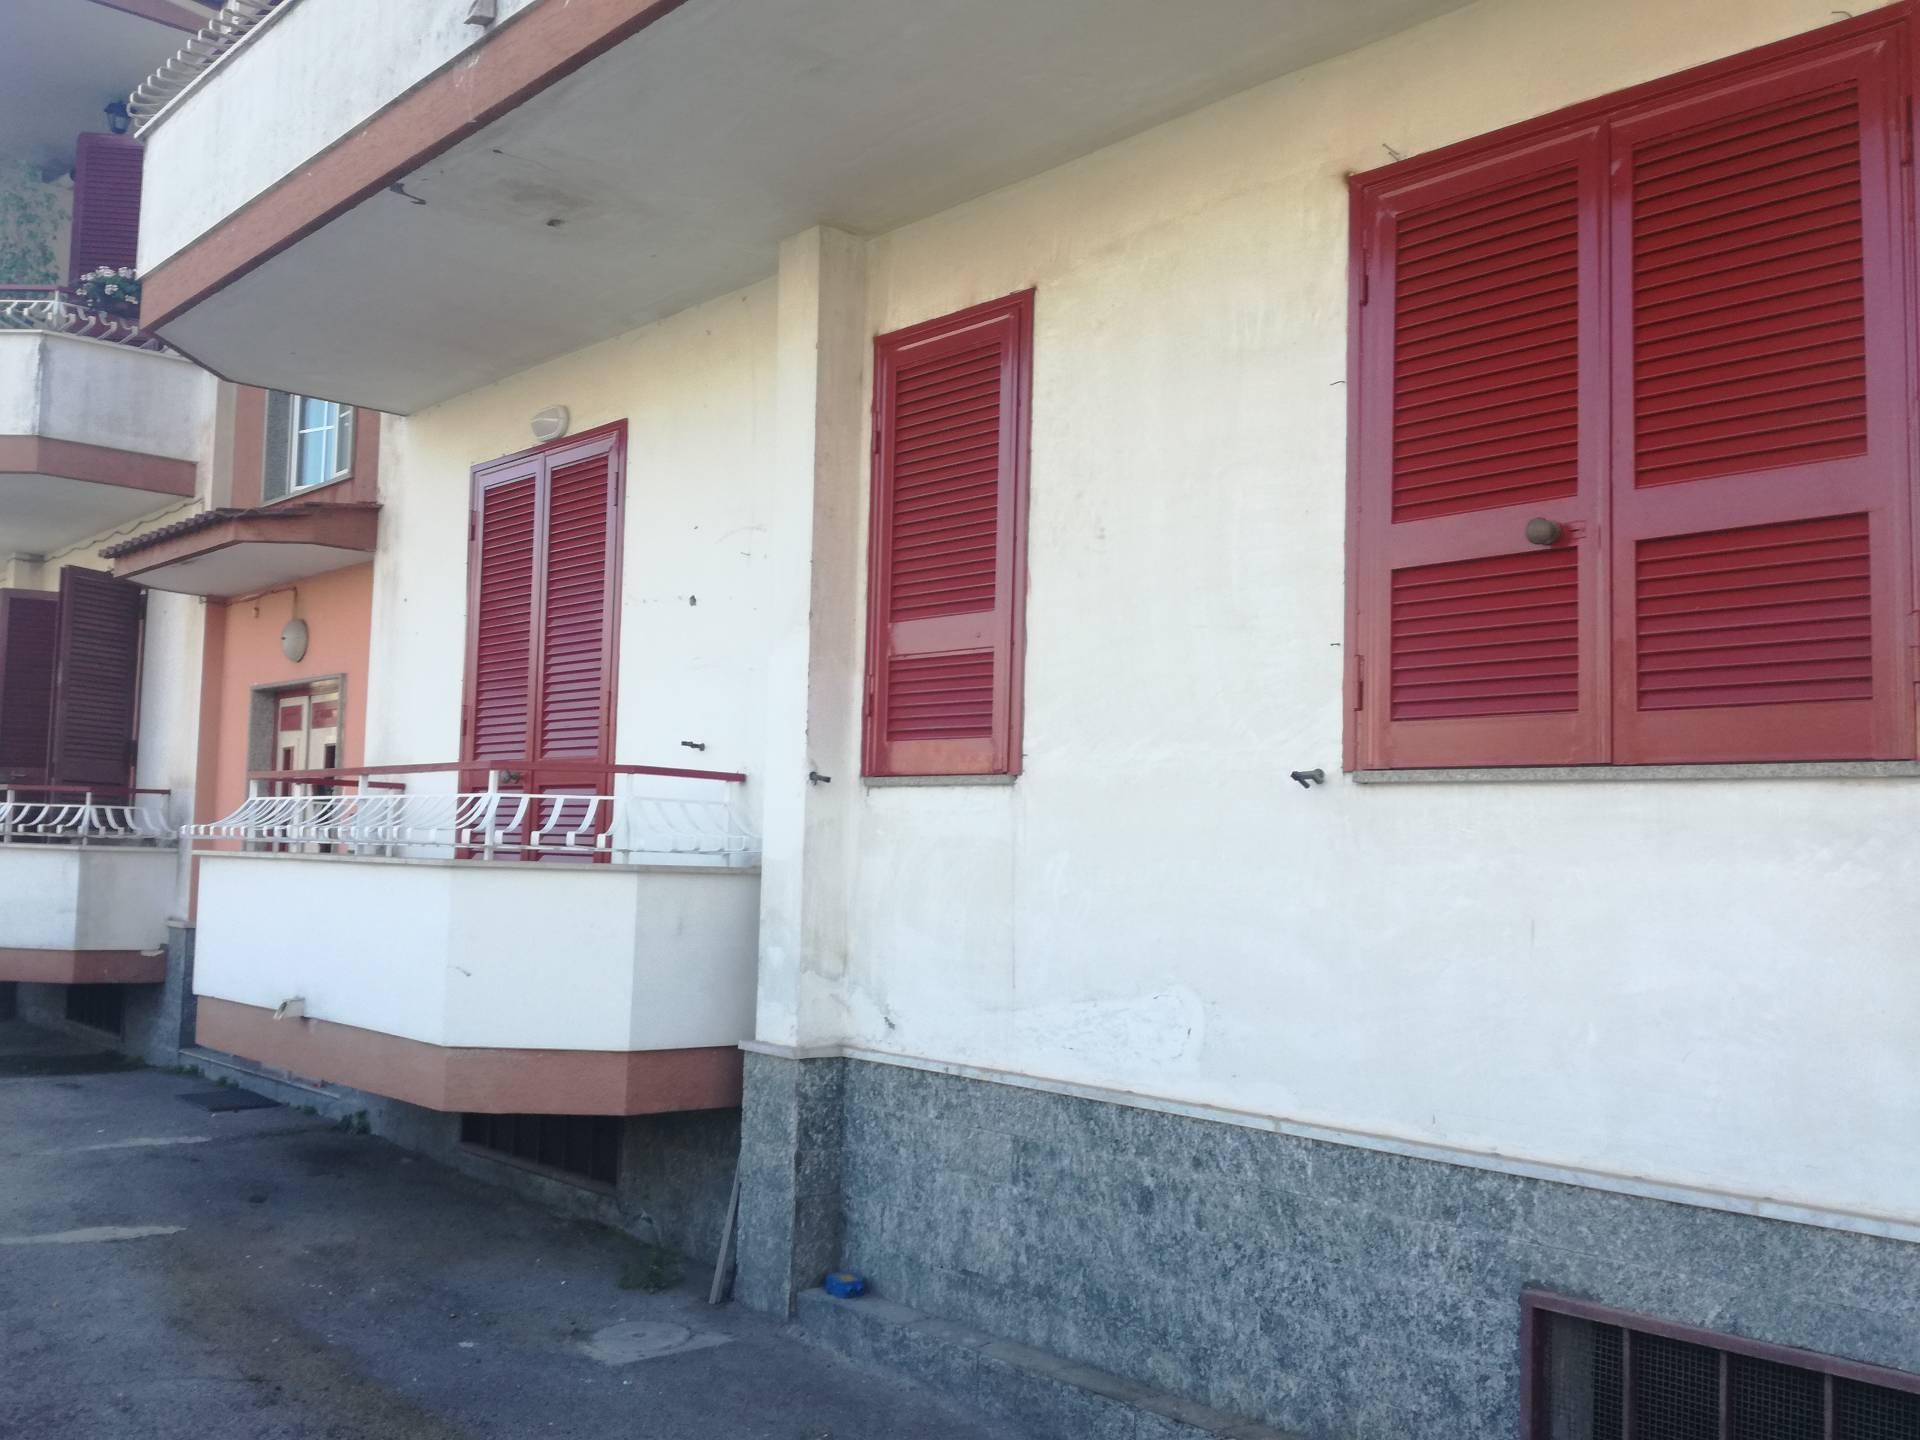 Appartamenti in vendita affitto a i migliori immobili a - Serranda elettrica casa ...